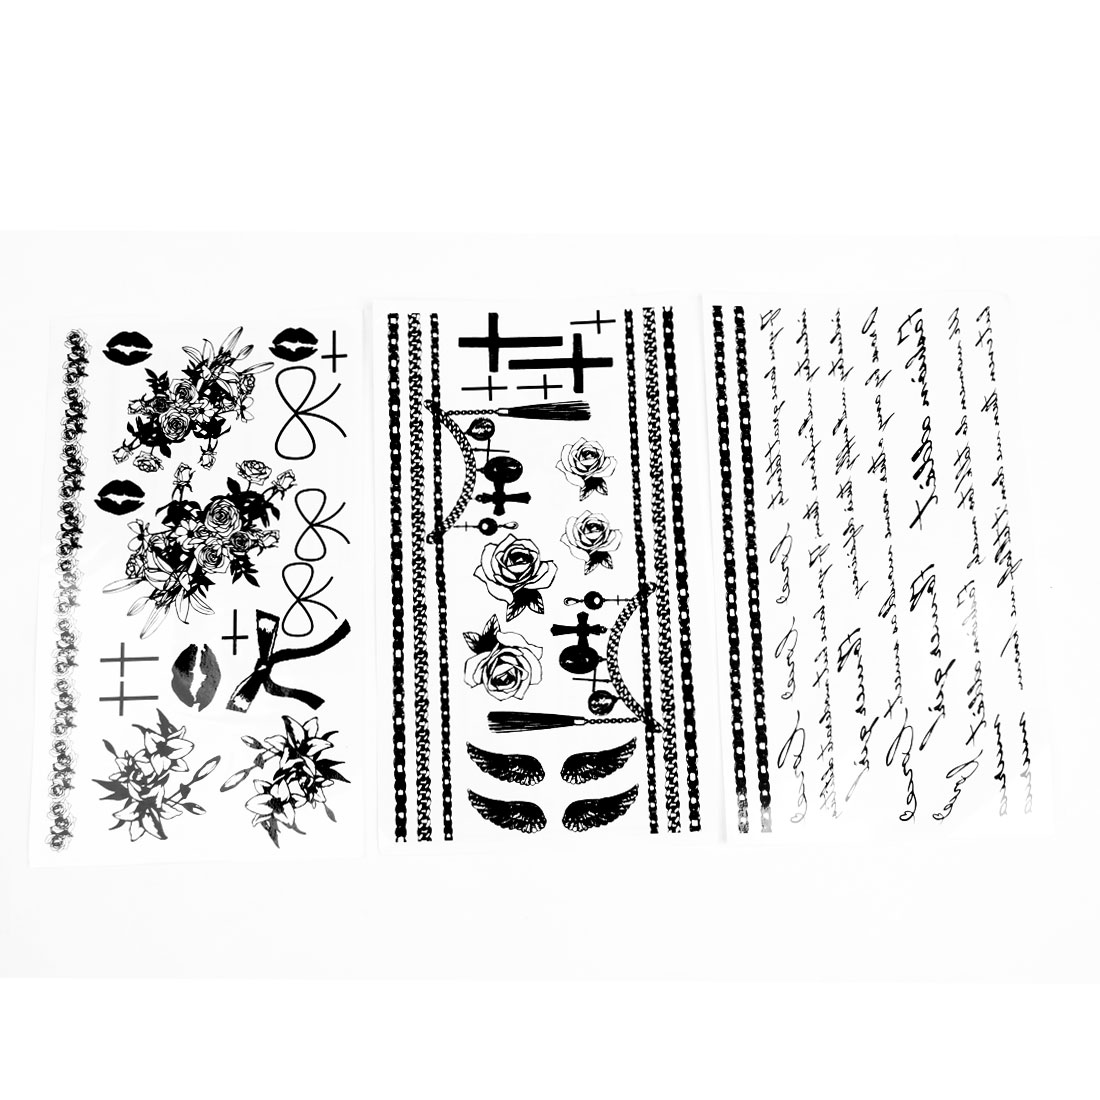 3 Pcs Black Flower Cross Lip Bowknot Pattern Transfer Tattoos Stickers Sheet